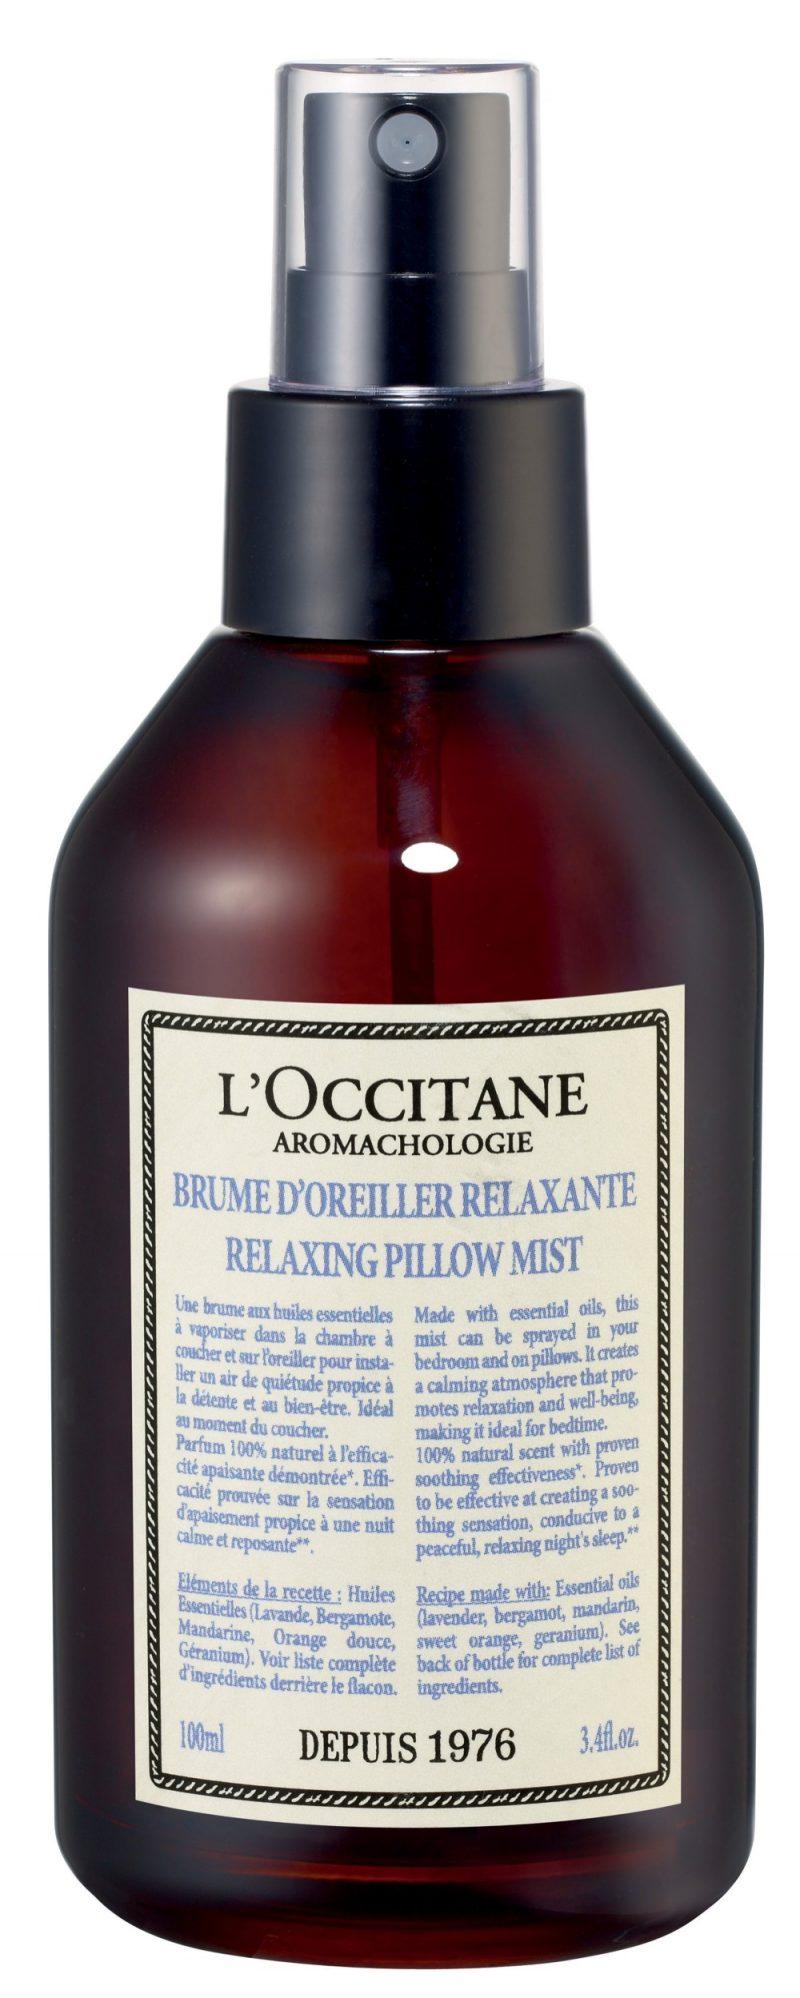 Spray Rilassante per cuscino AROMACHOLOGIE_L'Occitane